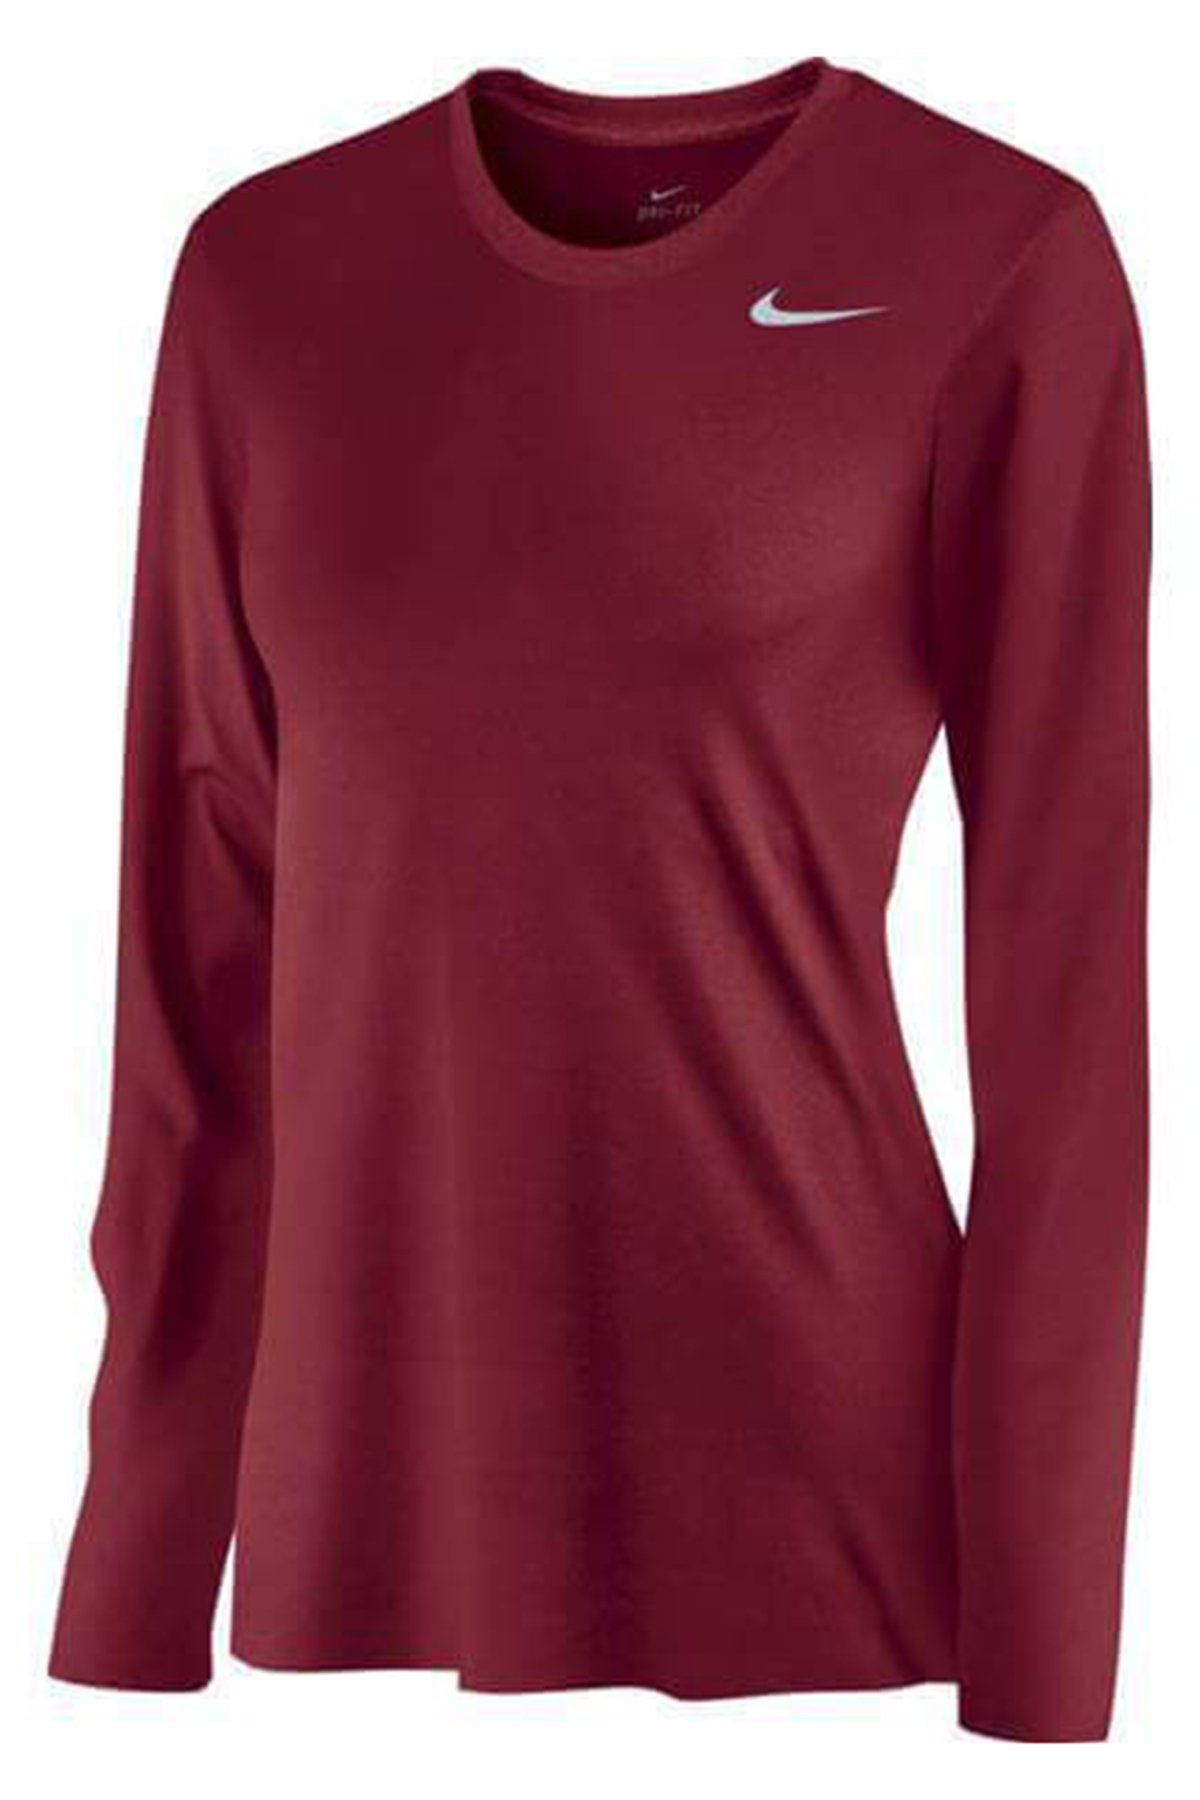 c5039faaf82 Nike Women's Legend Long Sleeve Tee 453182 Team Crimson/Cool Grey in ...